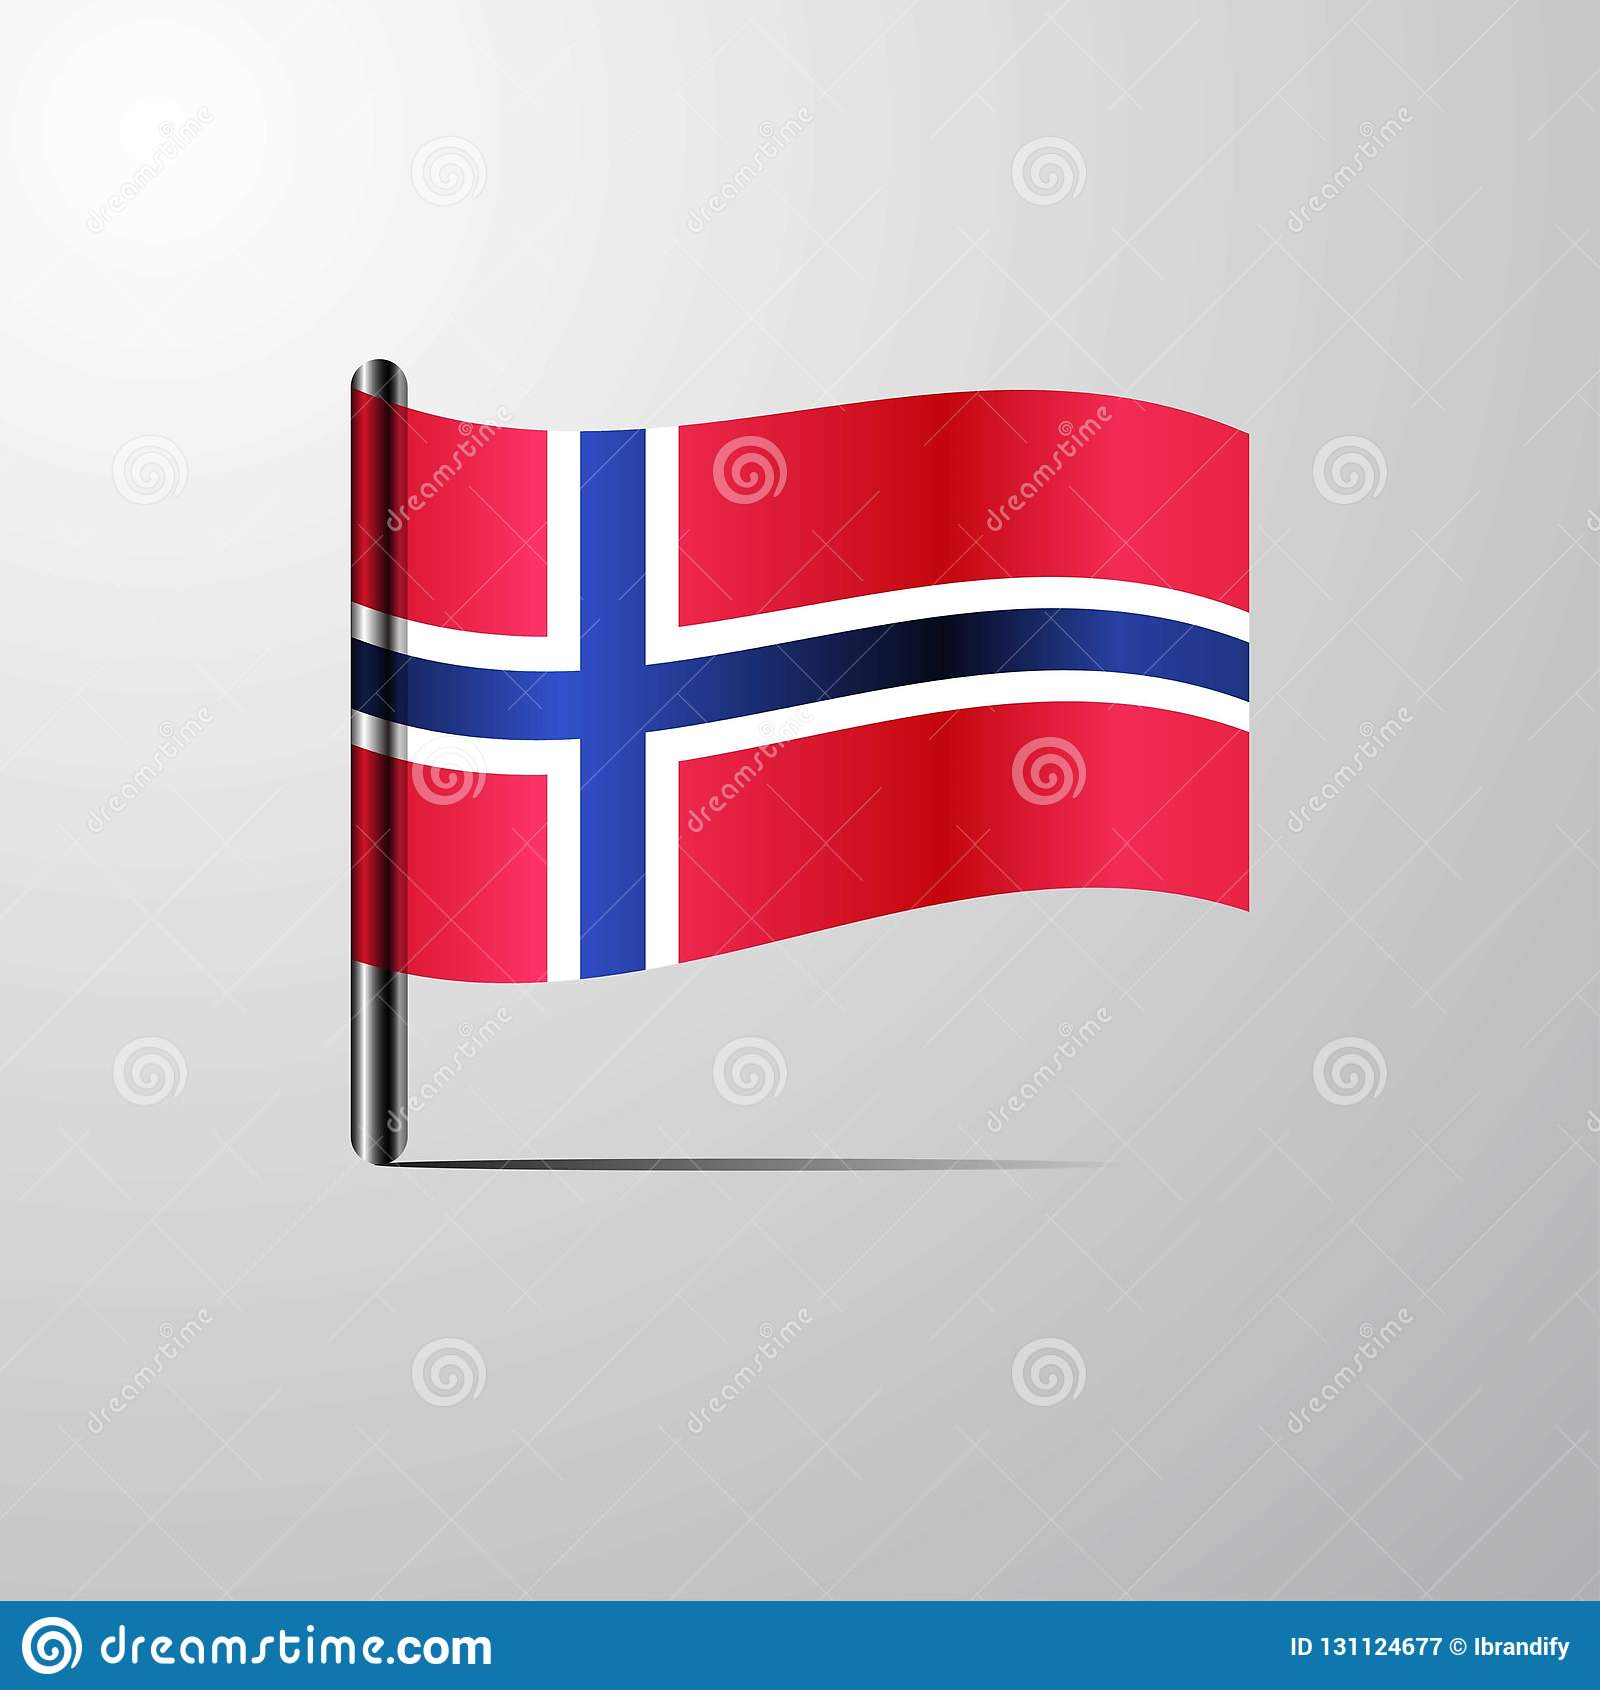 Norway Waving Shiny Flag Design Vector Stock Vector ...